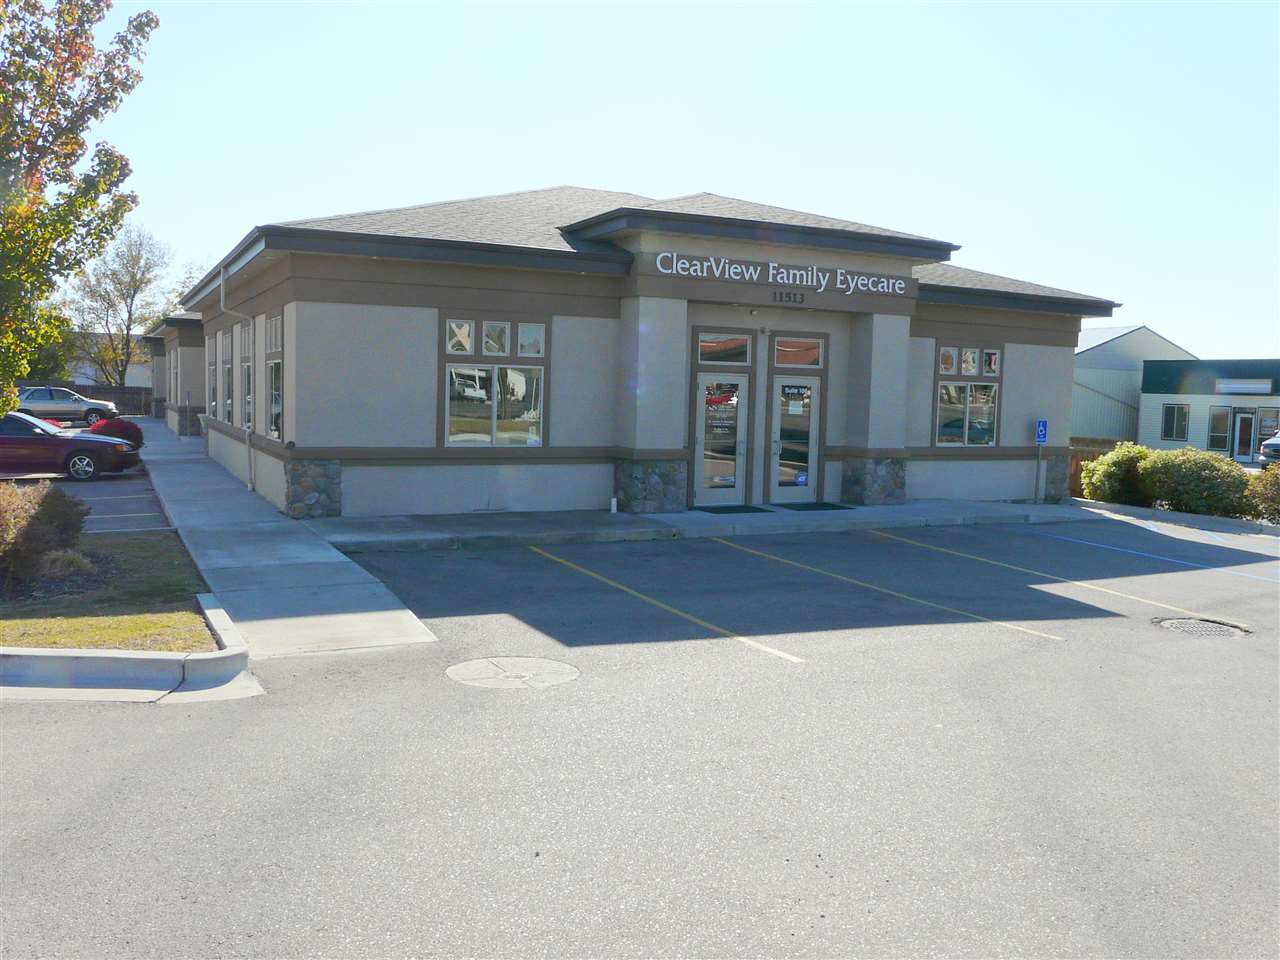 11513 W Fairview Ave., Boise, ID 83713